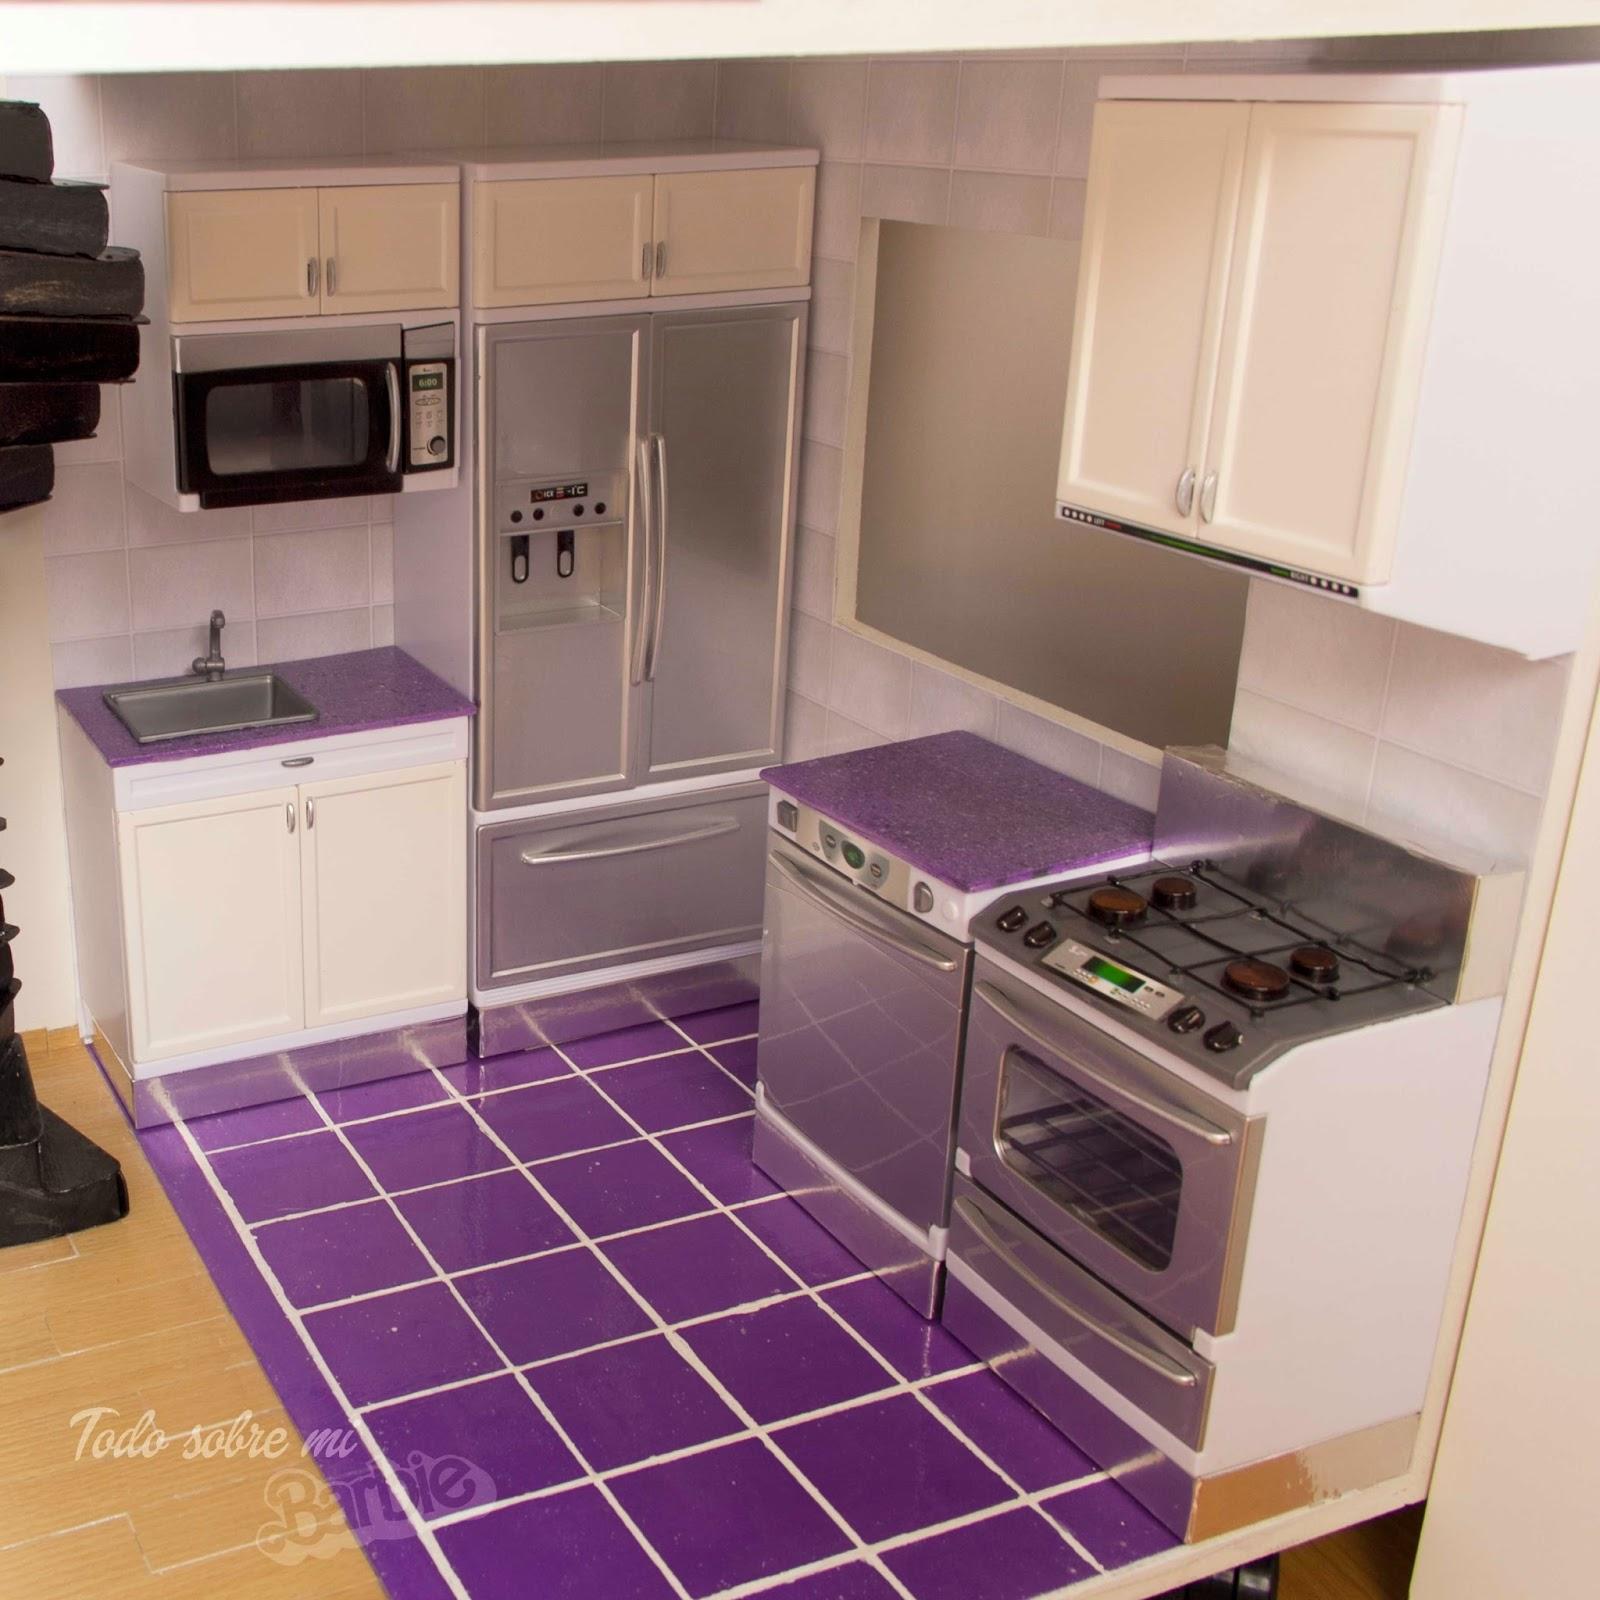 Todo sobre mi barbie c mo pintar muebles de pl stico cocina for Programa para crear muebles de cocina